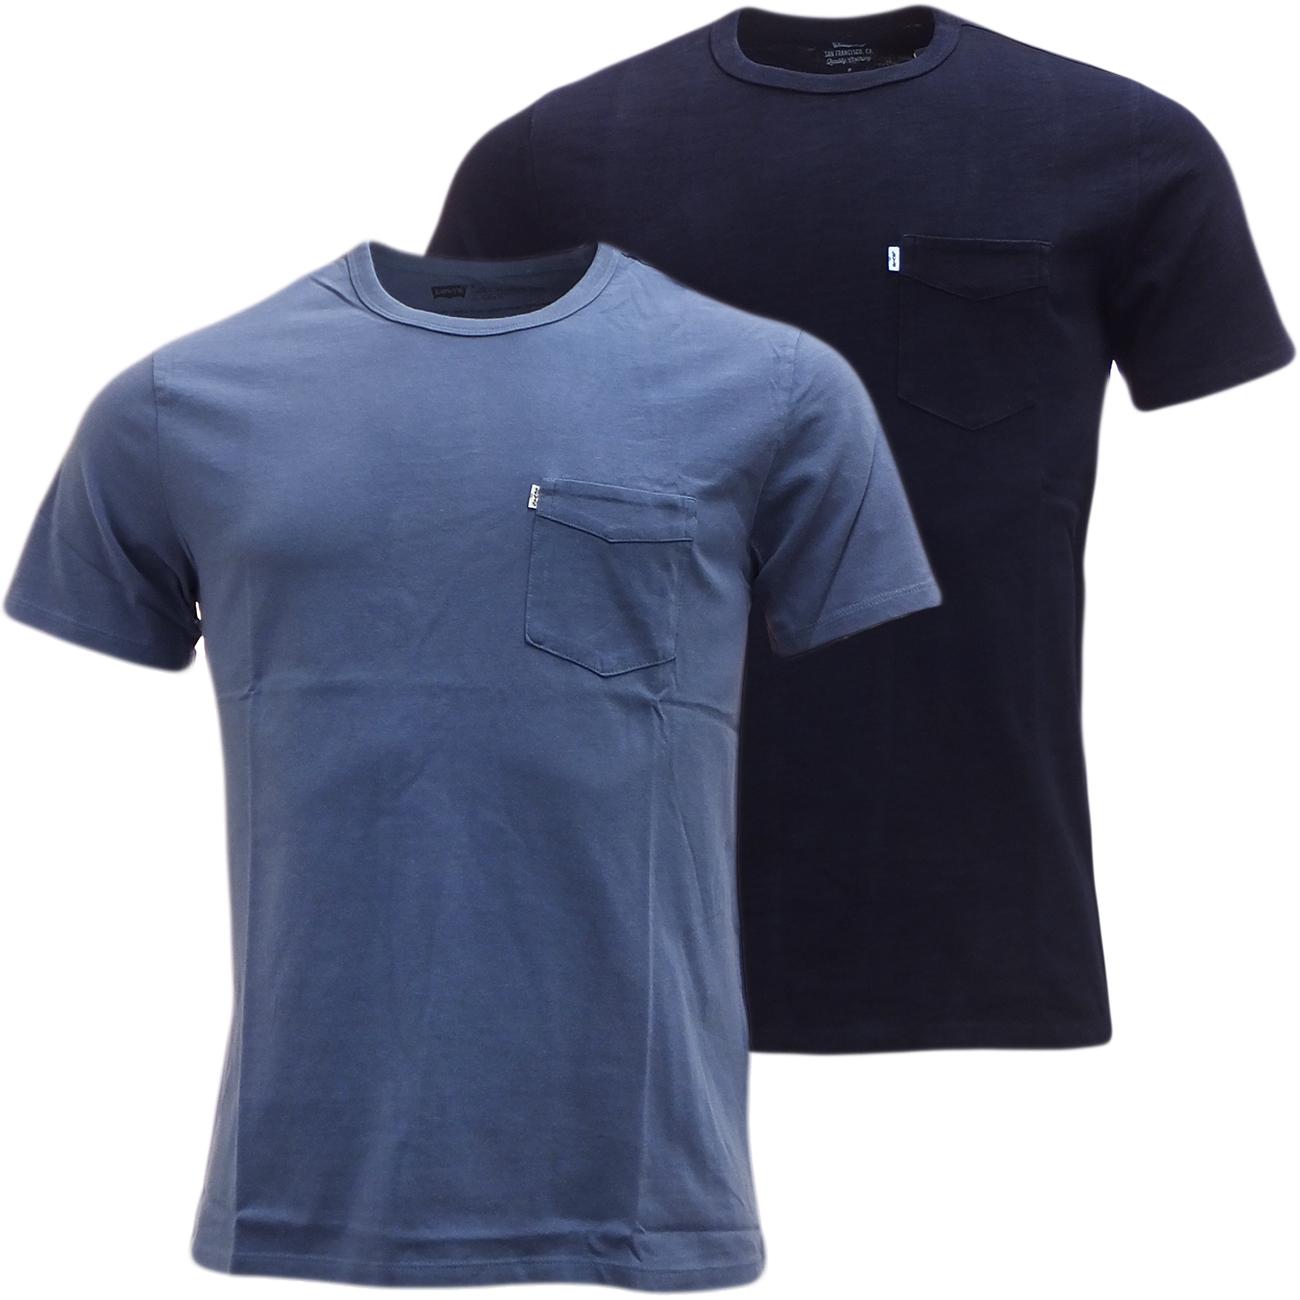 Mens levi plain t shirt with pocket ebay for Levis plain t shirts